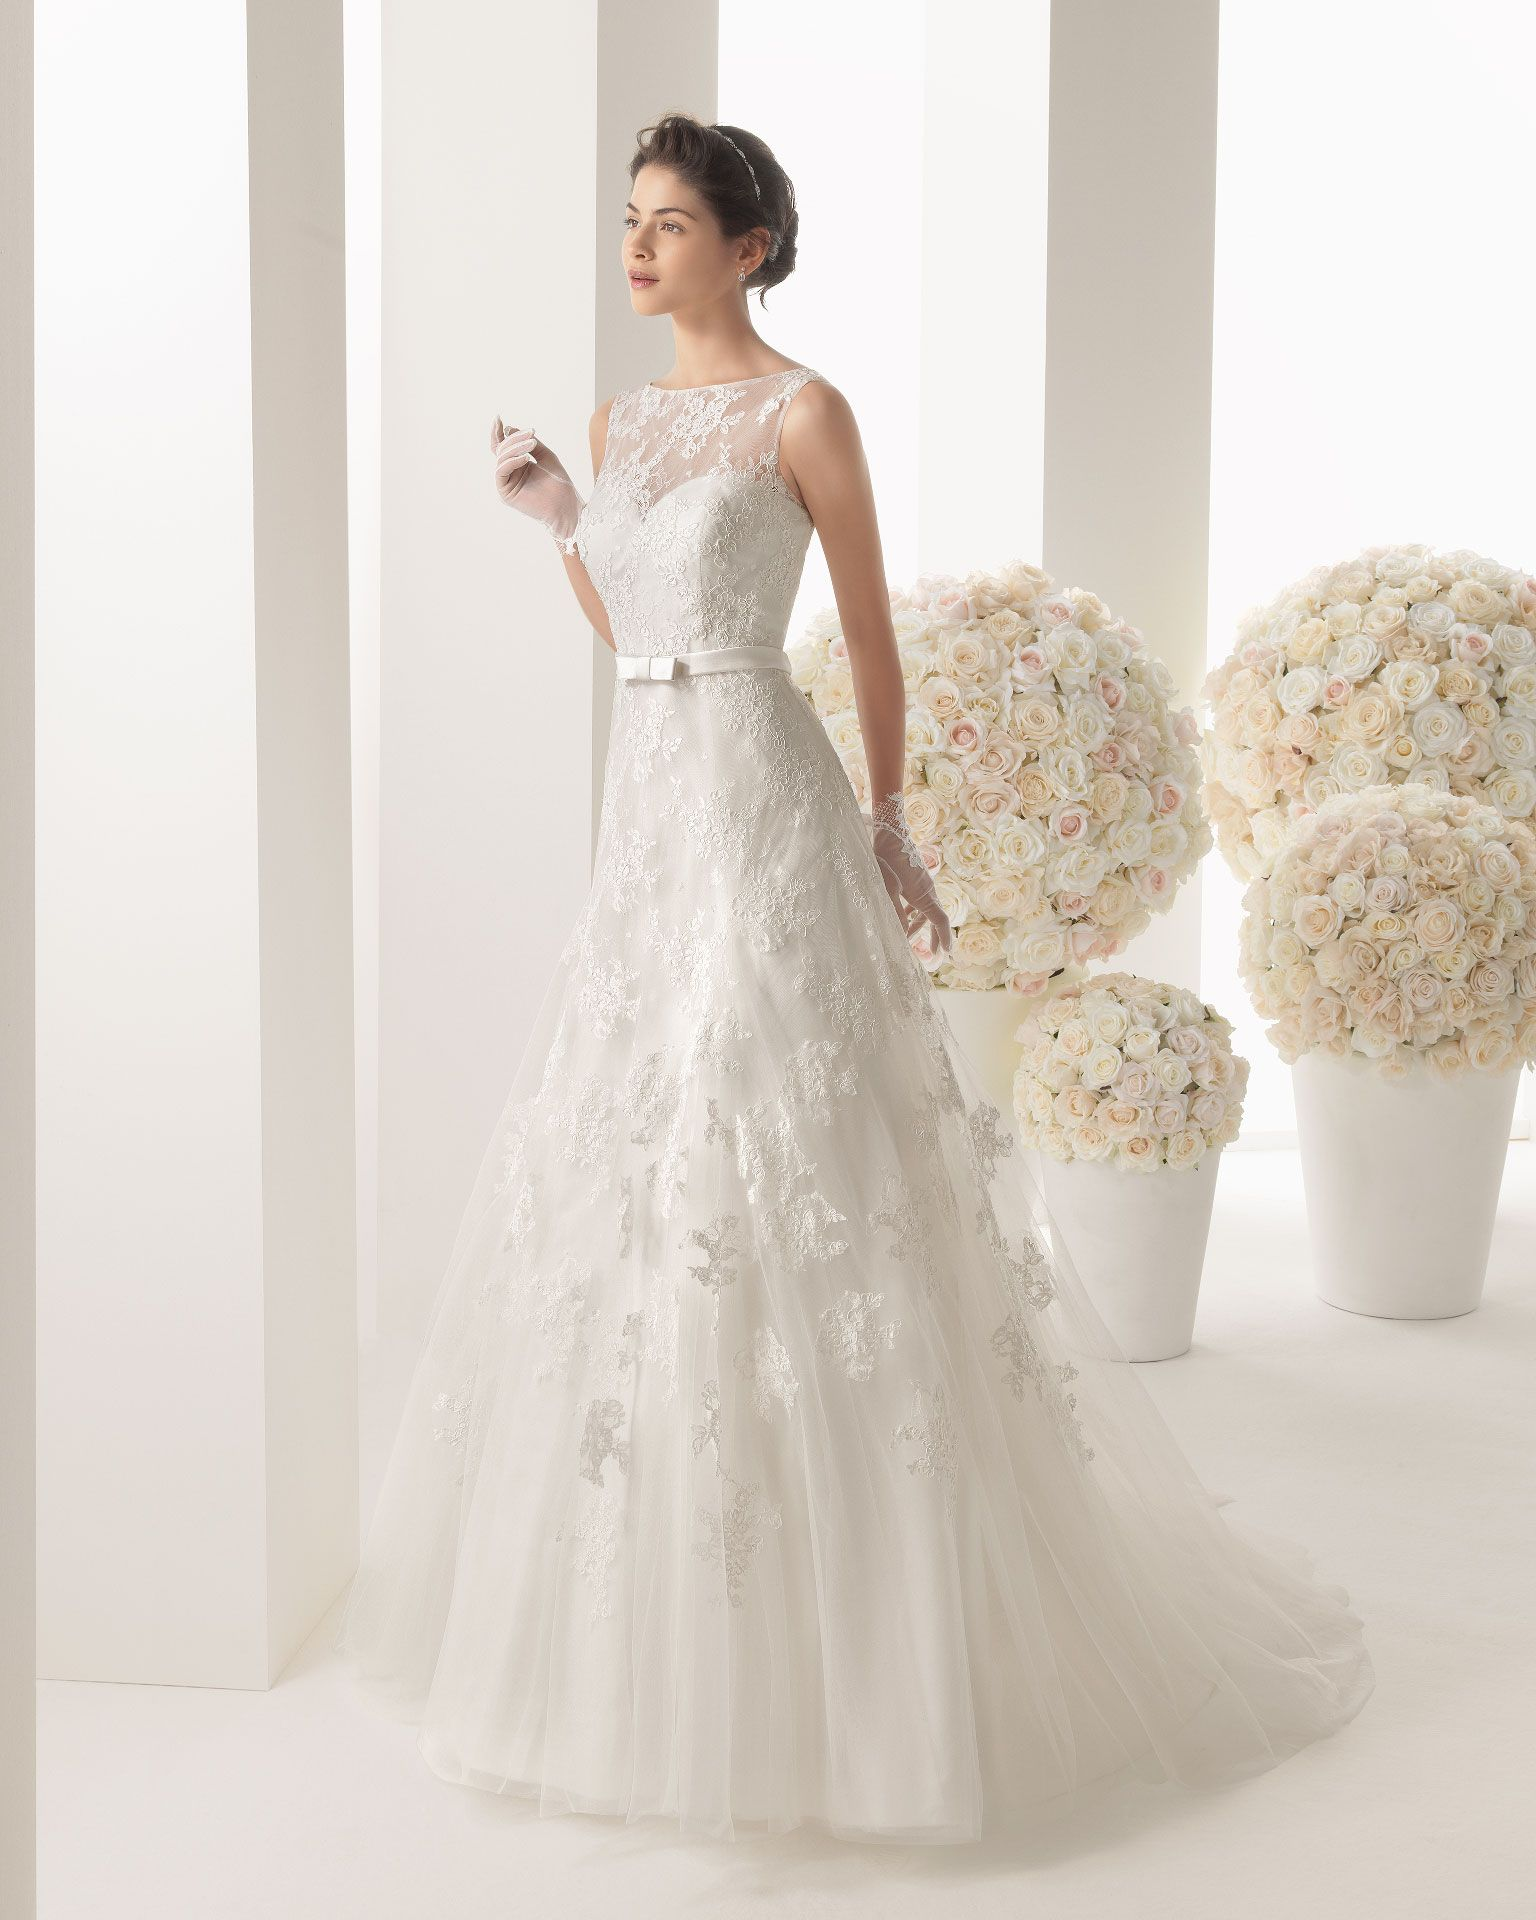 tank top wedding dresses Robes de mari e Rosa Clara Malena Two Like the style Noble A Line Tank Top Lace Ivory Brush Train Wedding Dress